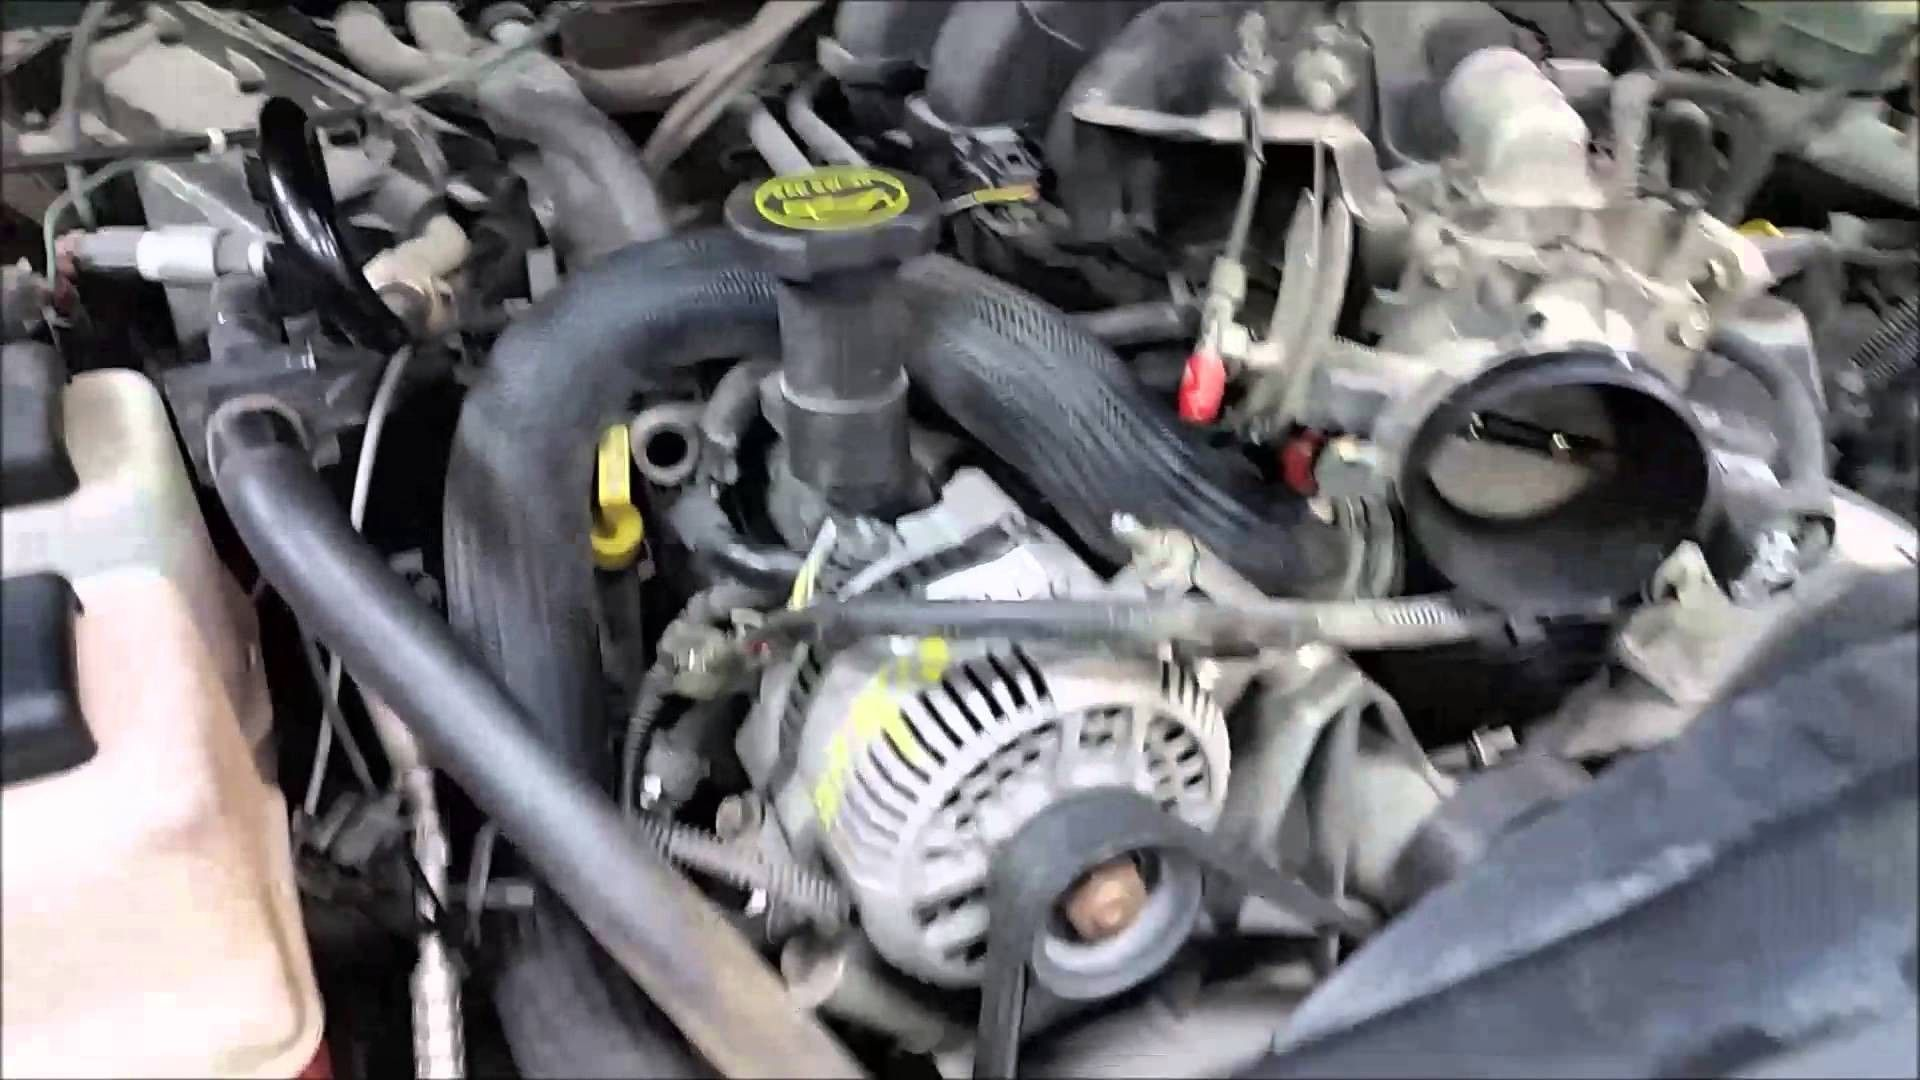 1999 Ford Explorer 4 0 Sohc Engine Diagram Ford Explorer Leak Repair Ford